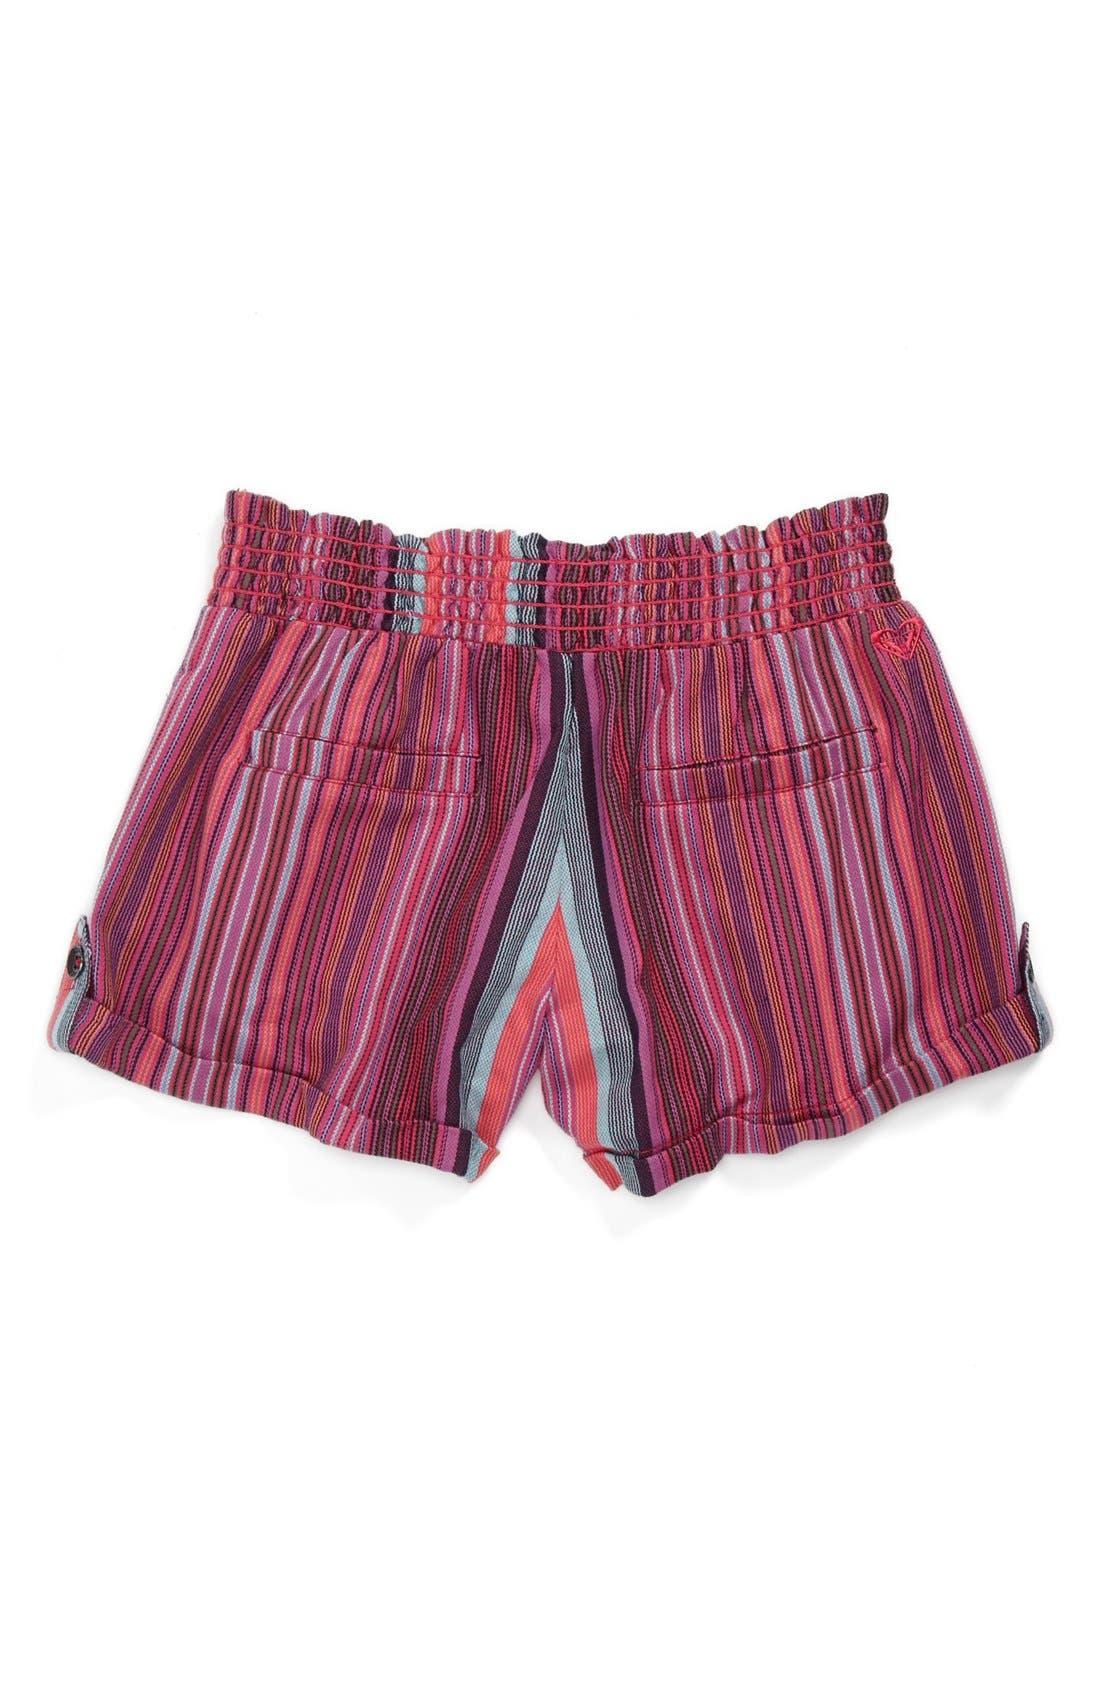 Alternate Image 2  - Roxy 'Beach Comber' Yarn Dye Shorts (Big Girls)